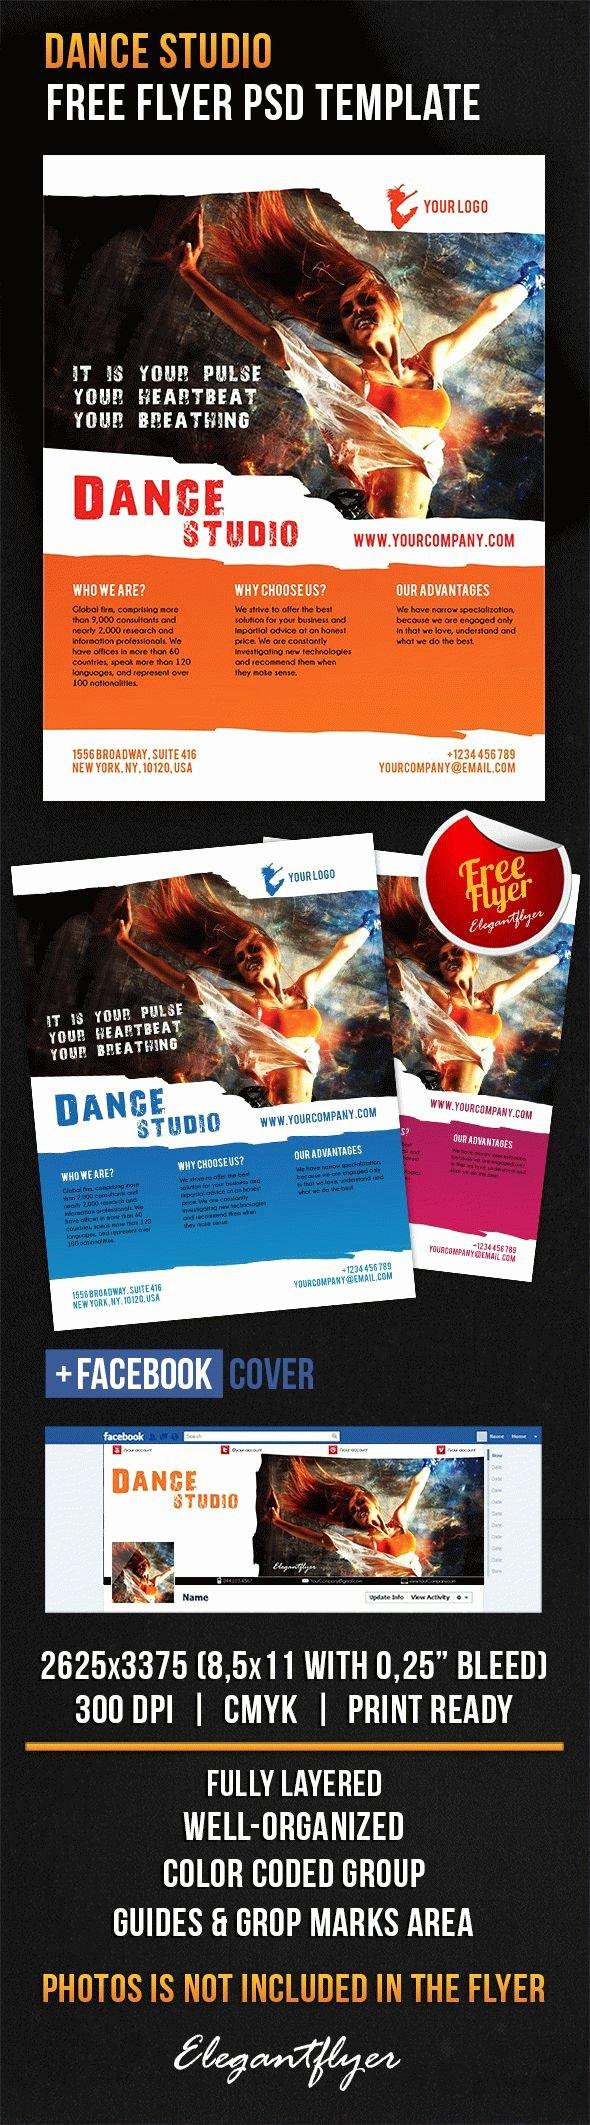 Facebook Cover Template Psd Unique Get Free Flyer Template Shop Dance Studio